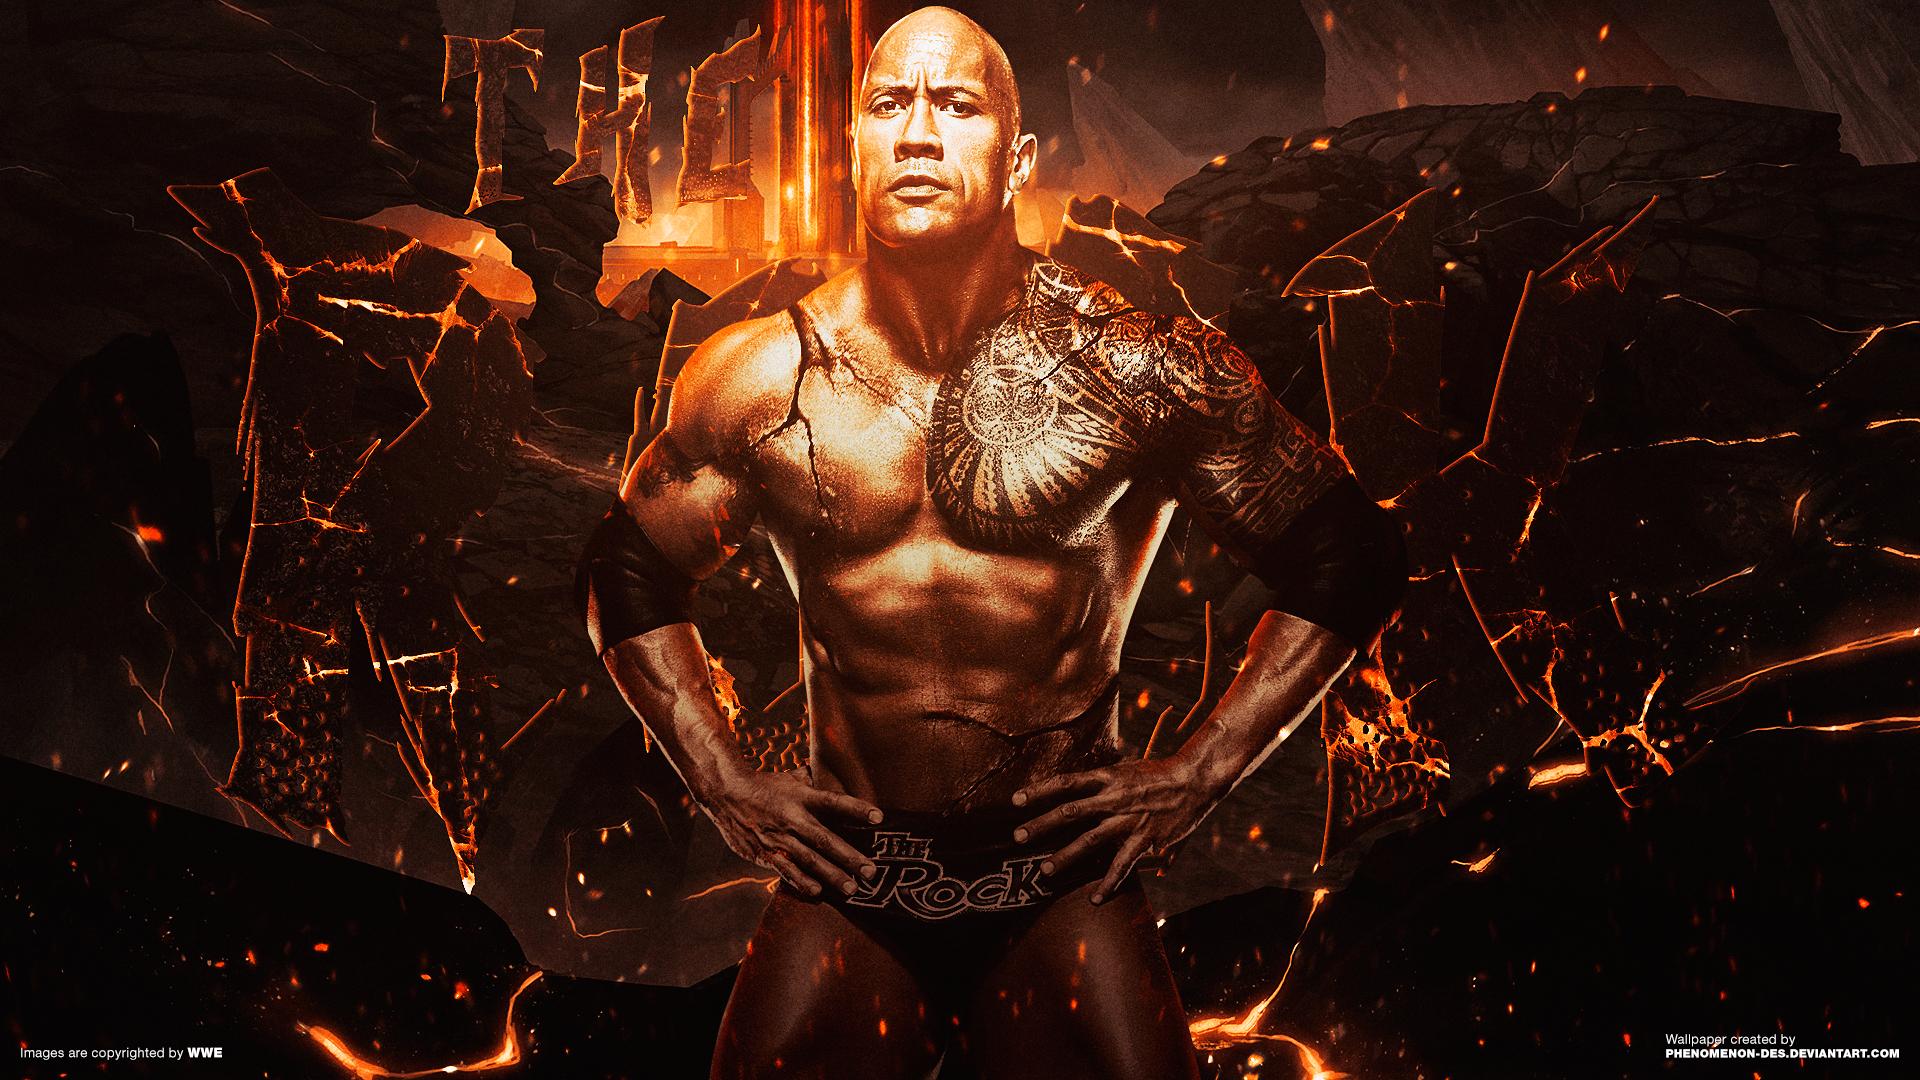 WWE The Rock Wallpaper V2 By Phenomenon-Des On DeviantArt